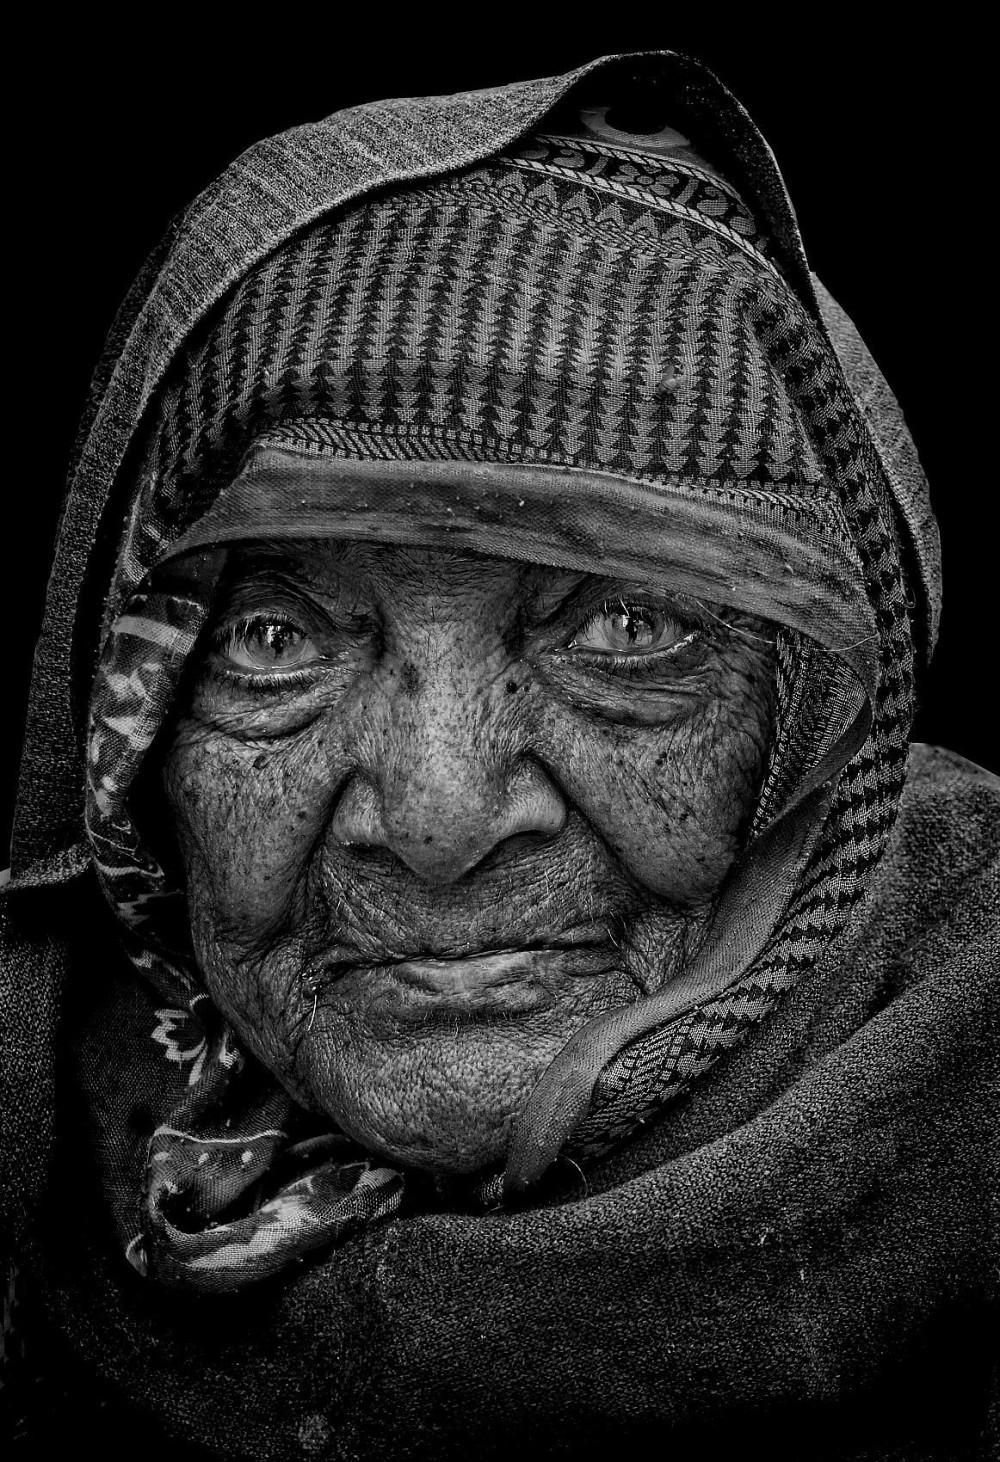 matriarch Rajasthani woman monochrome natural lite